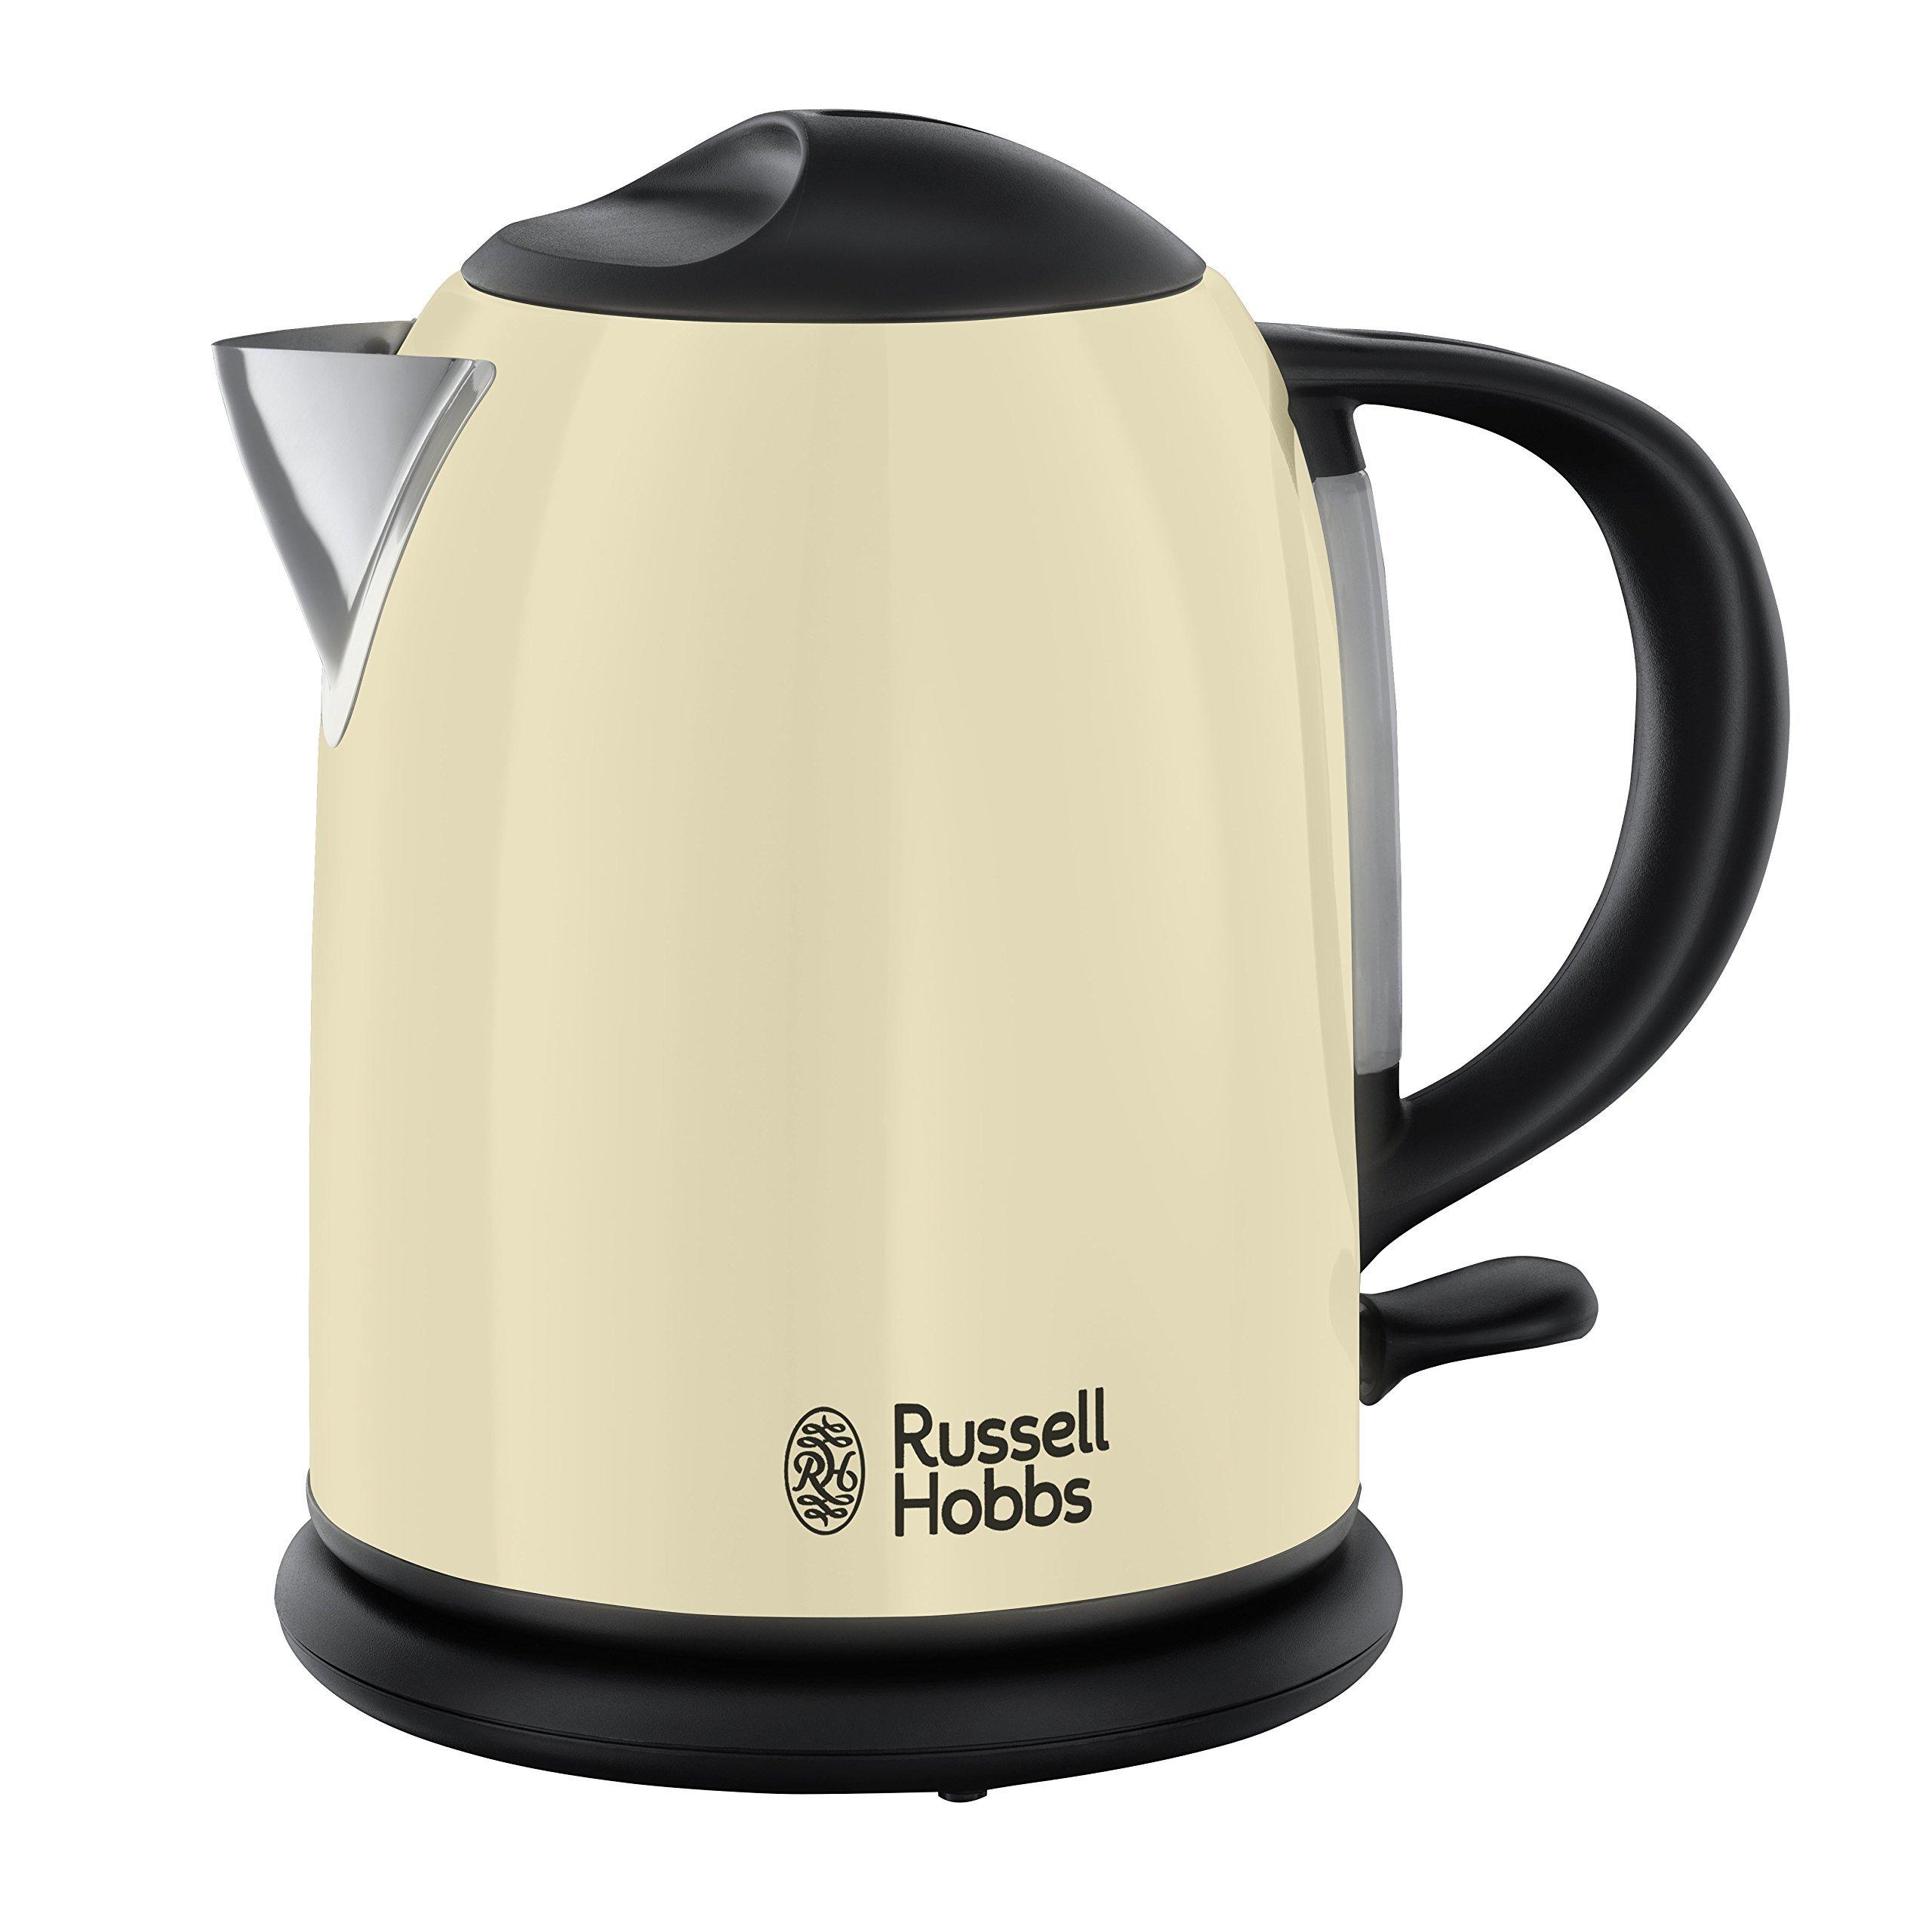 Russell Hobbs Colours Cream - Hervidor de agua compacto, 1L, resistencia oculta, 2200 W, acero inoxidable color crema - ref. 20194-70